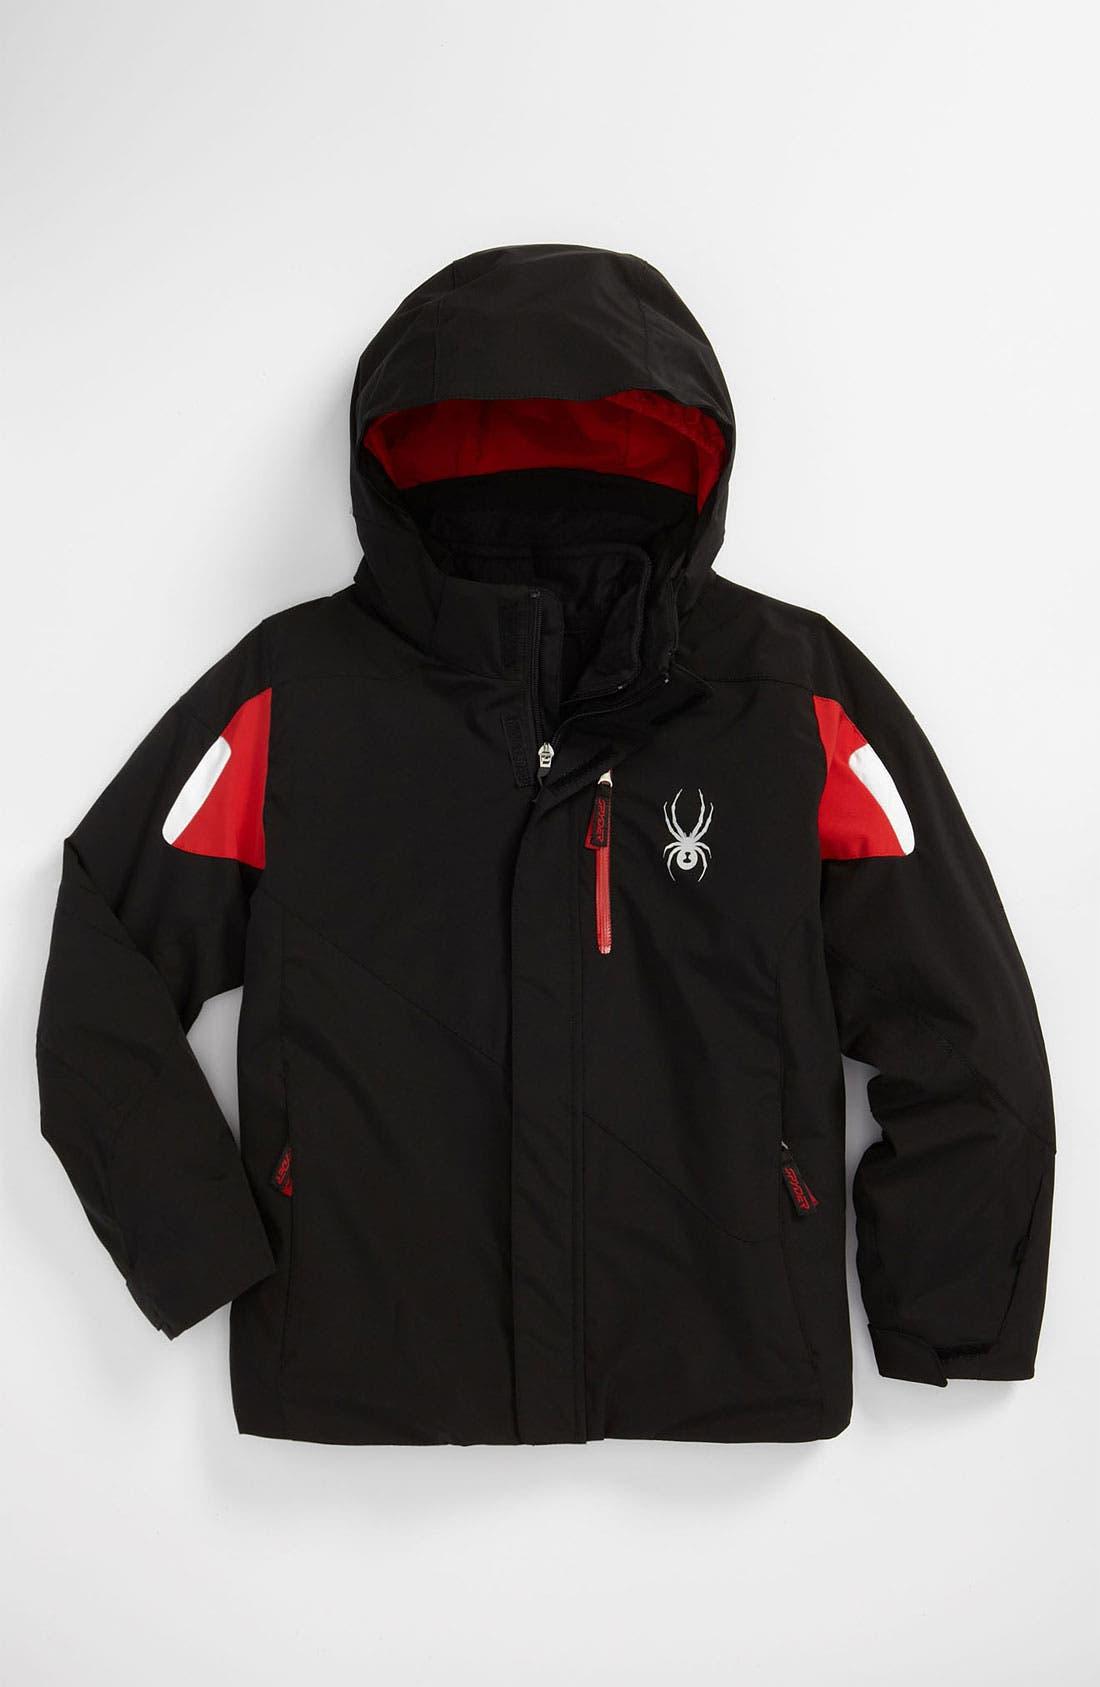 Main Image - Spyder 'Fang Core' Jacket (Big Boys)